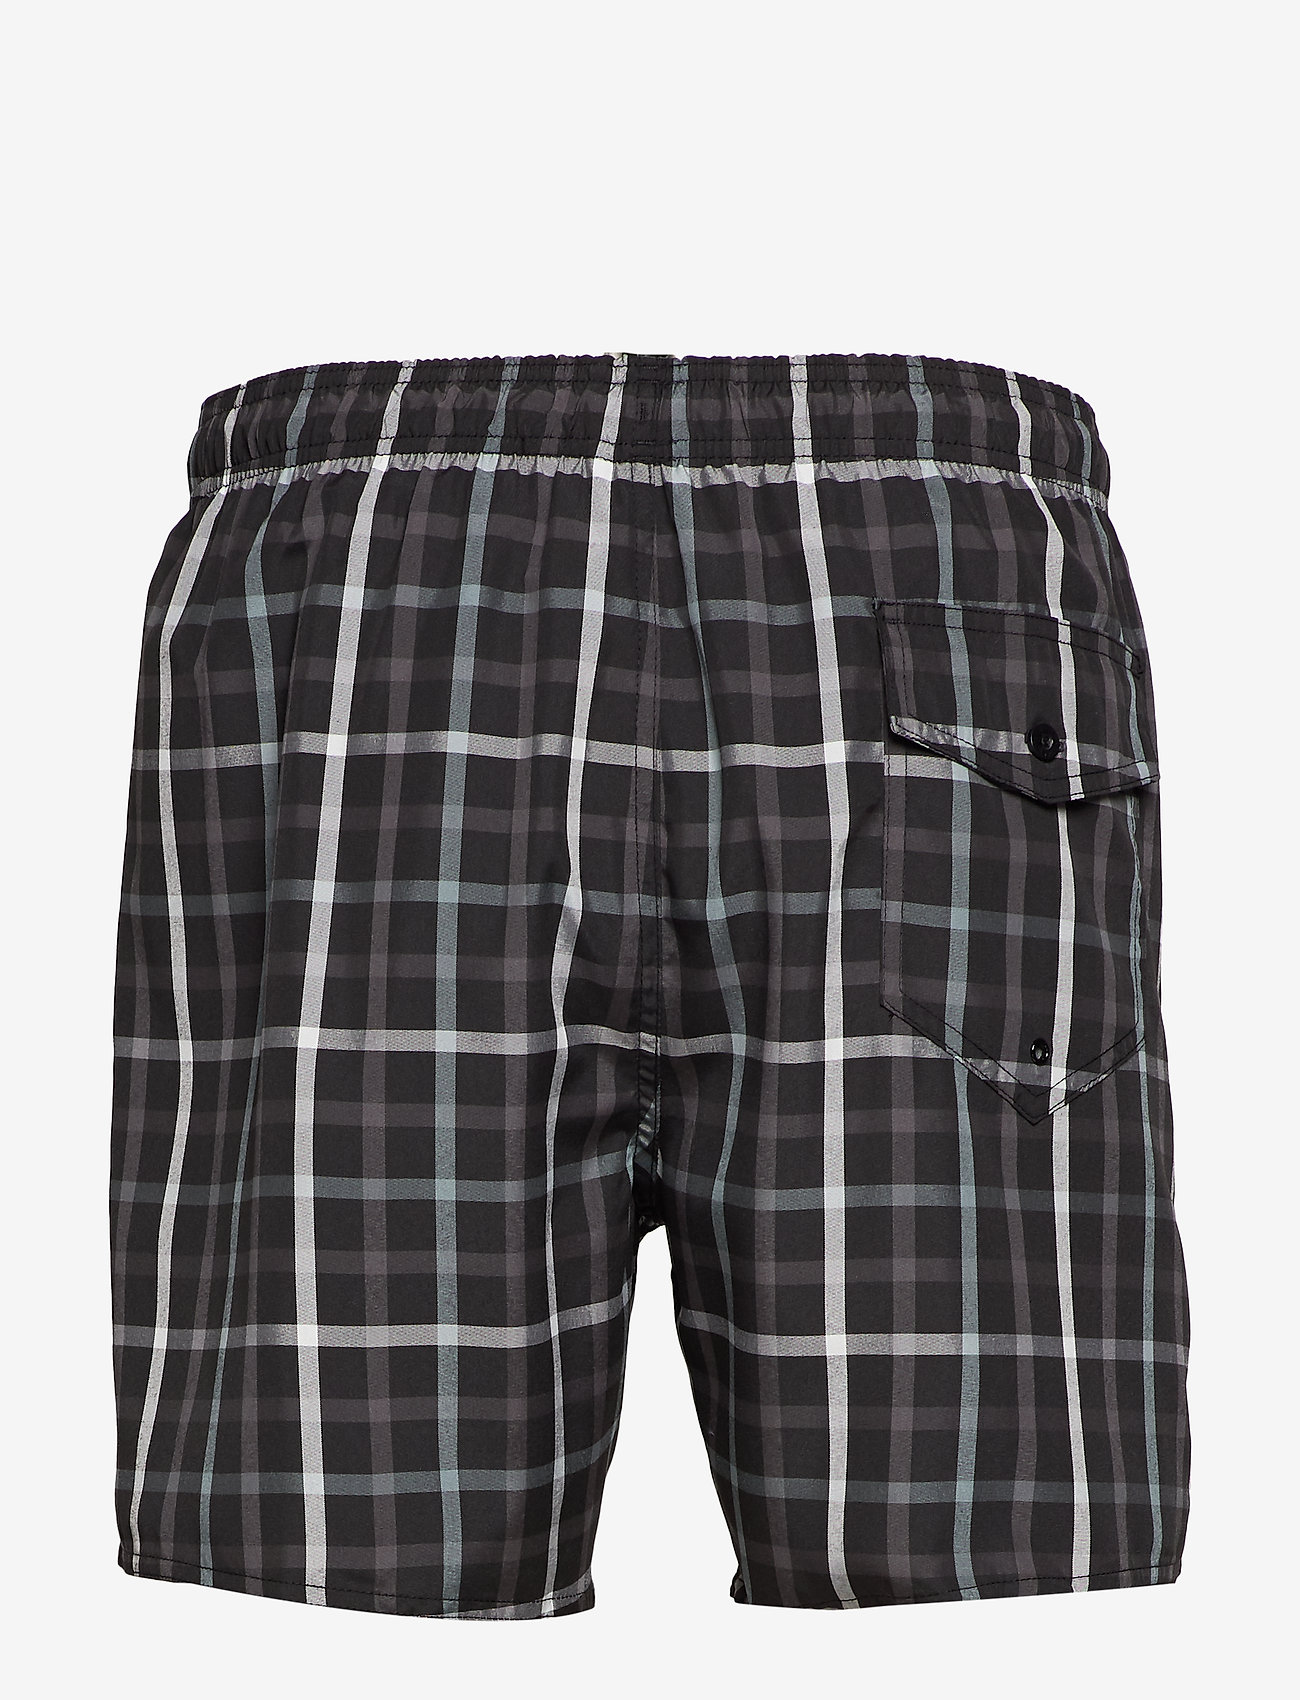 "Speedo - Check Leisure 16"" Watershort - shorts - black/oxid grey/usa charcoal - 1"